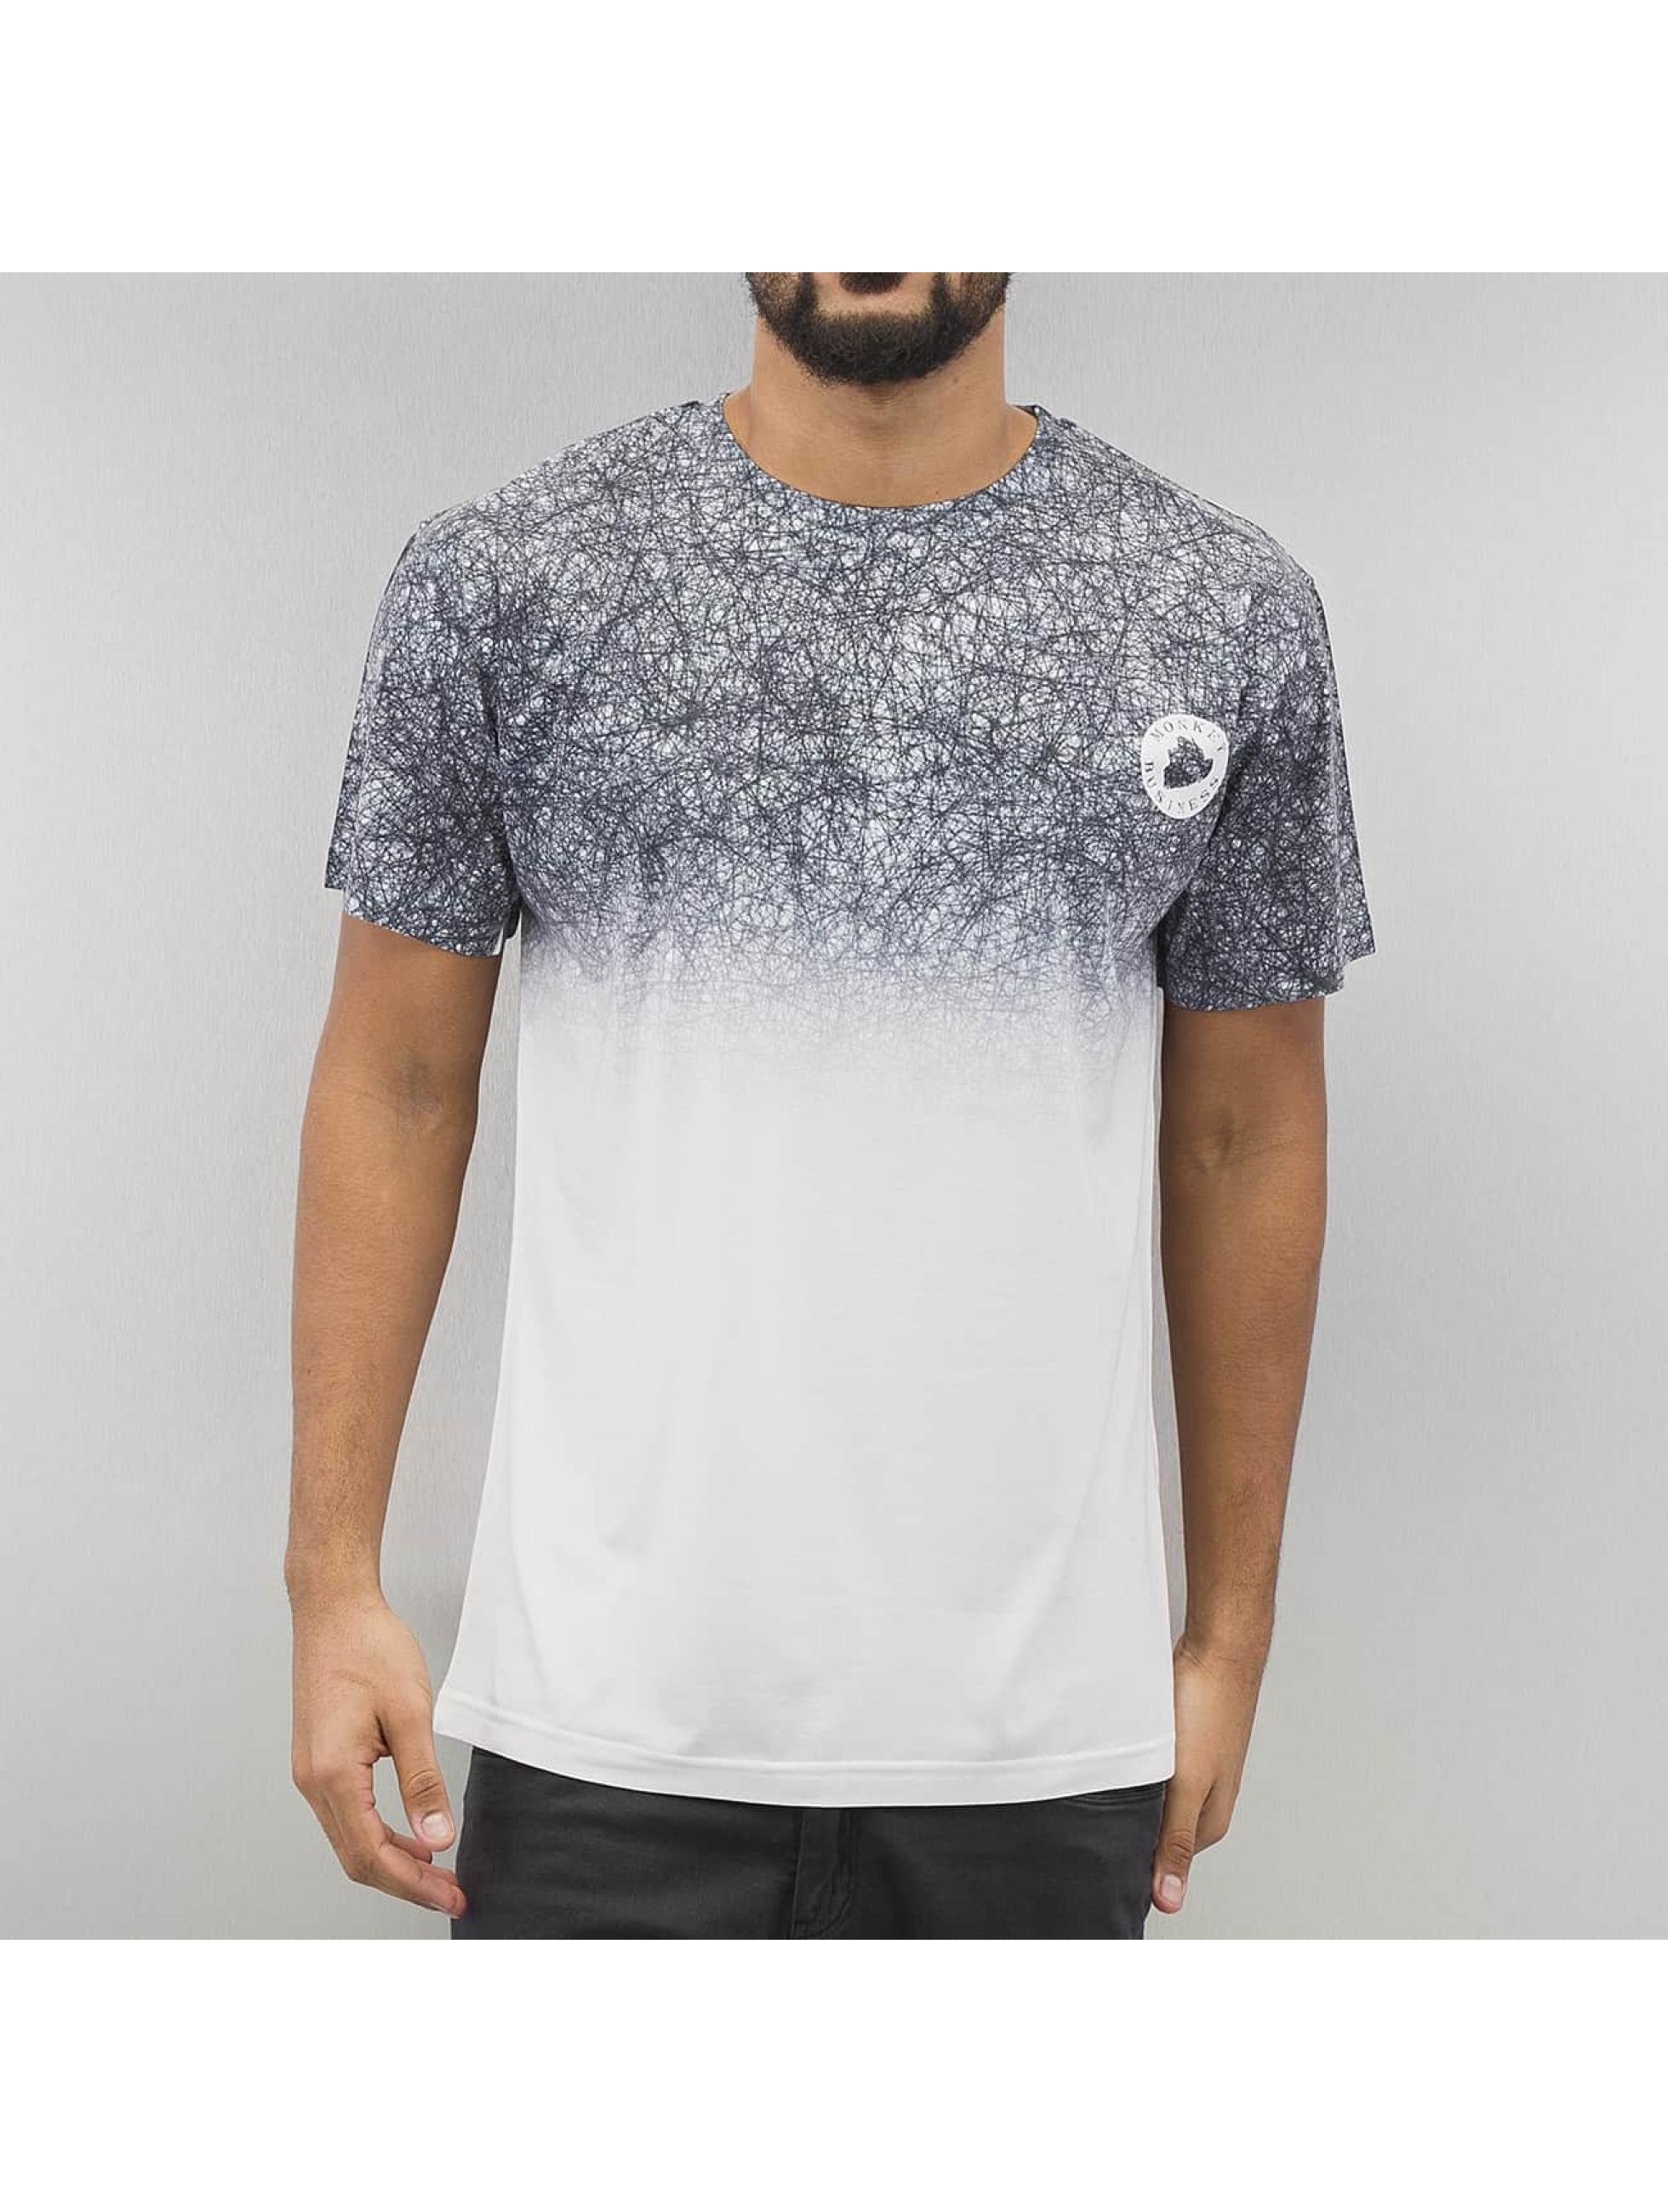 Monkey Business T-Shirt Black Scribble gray